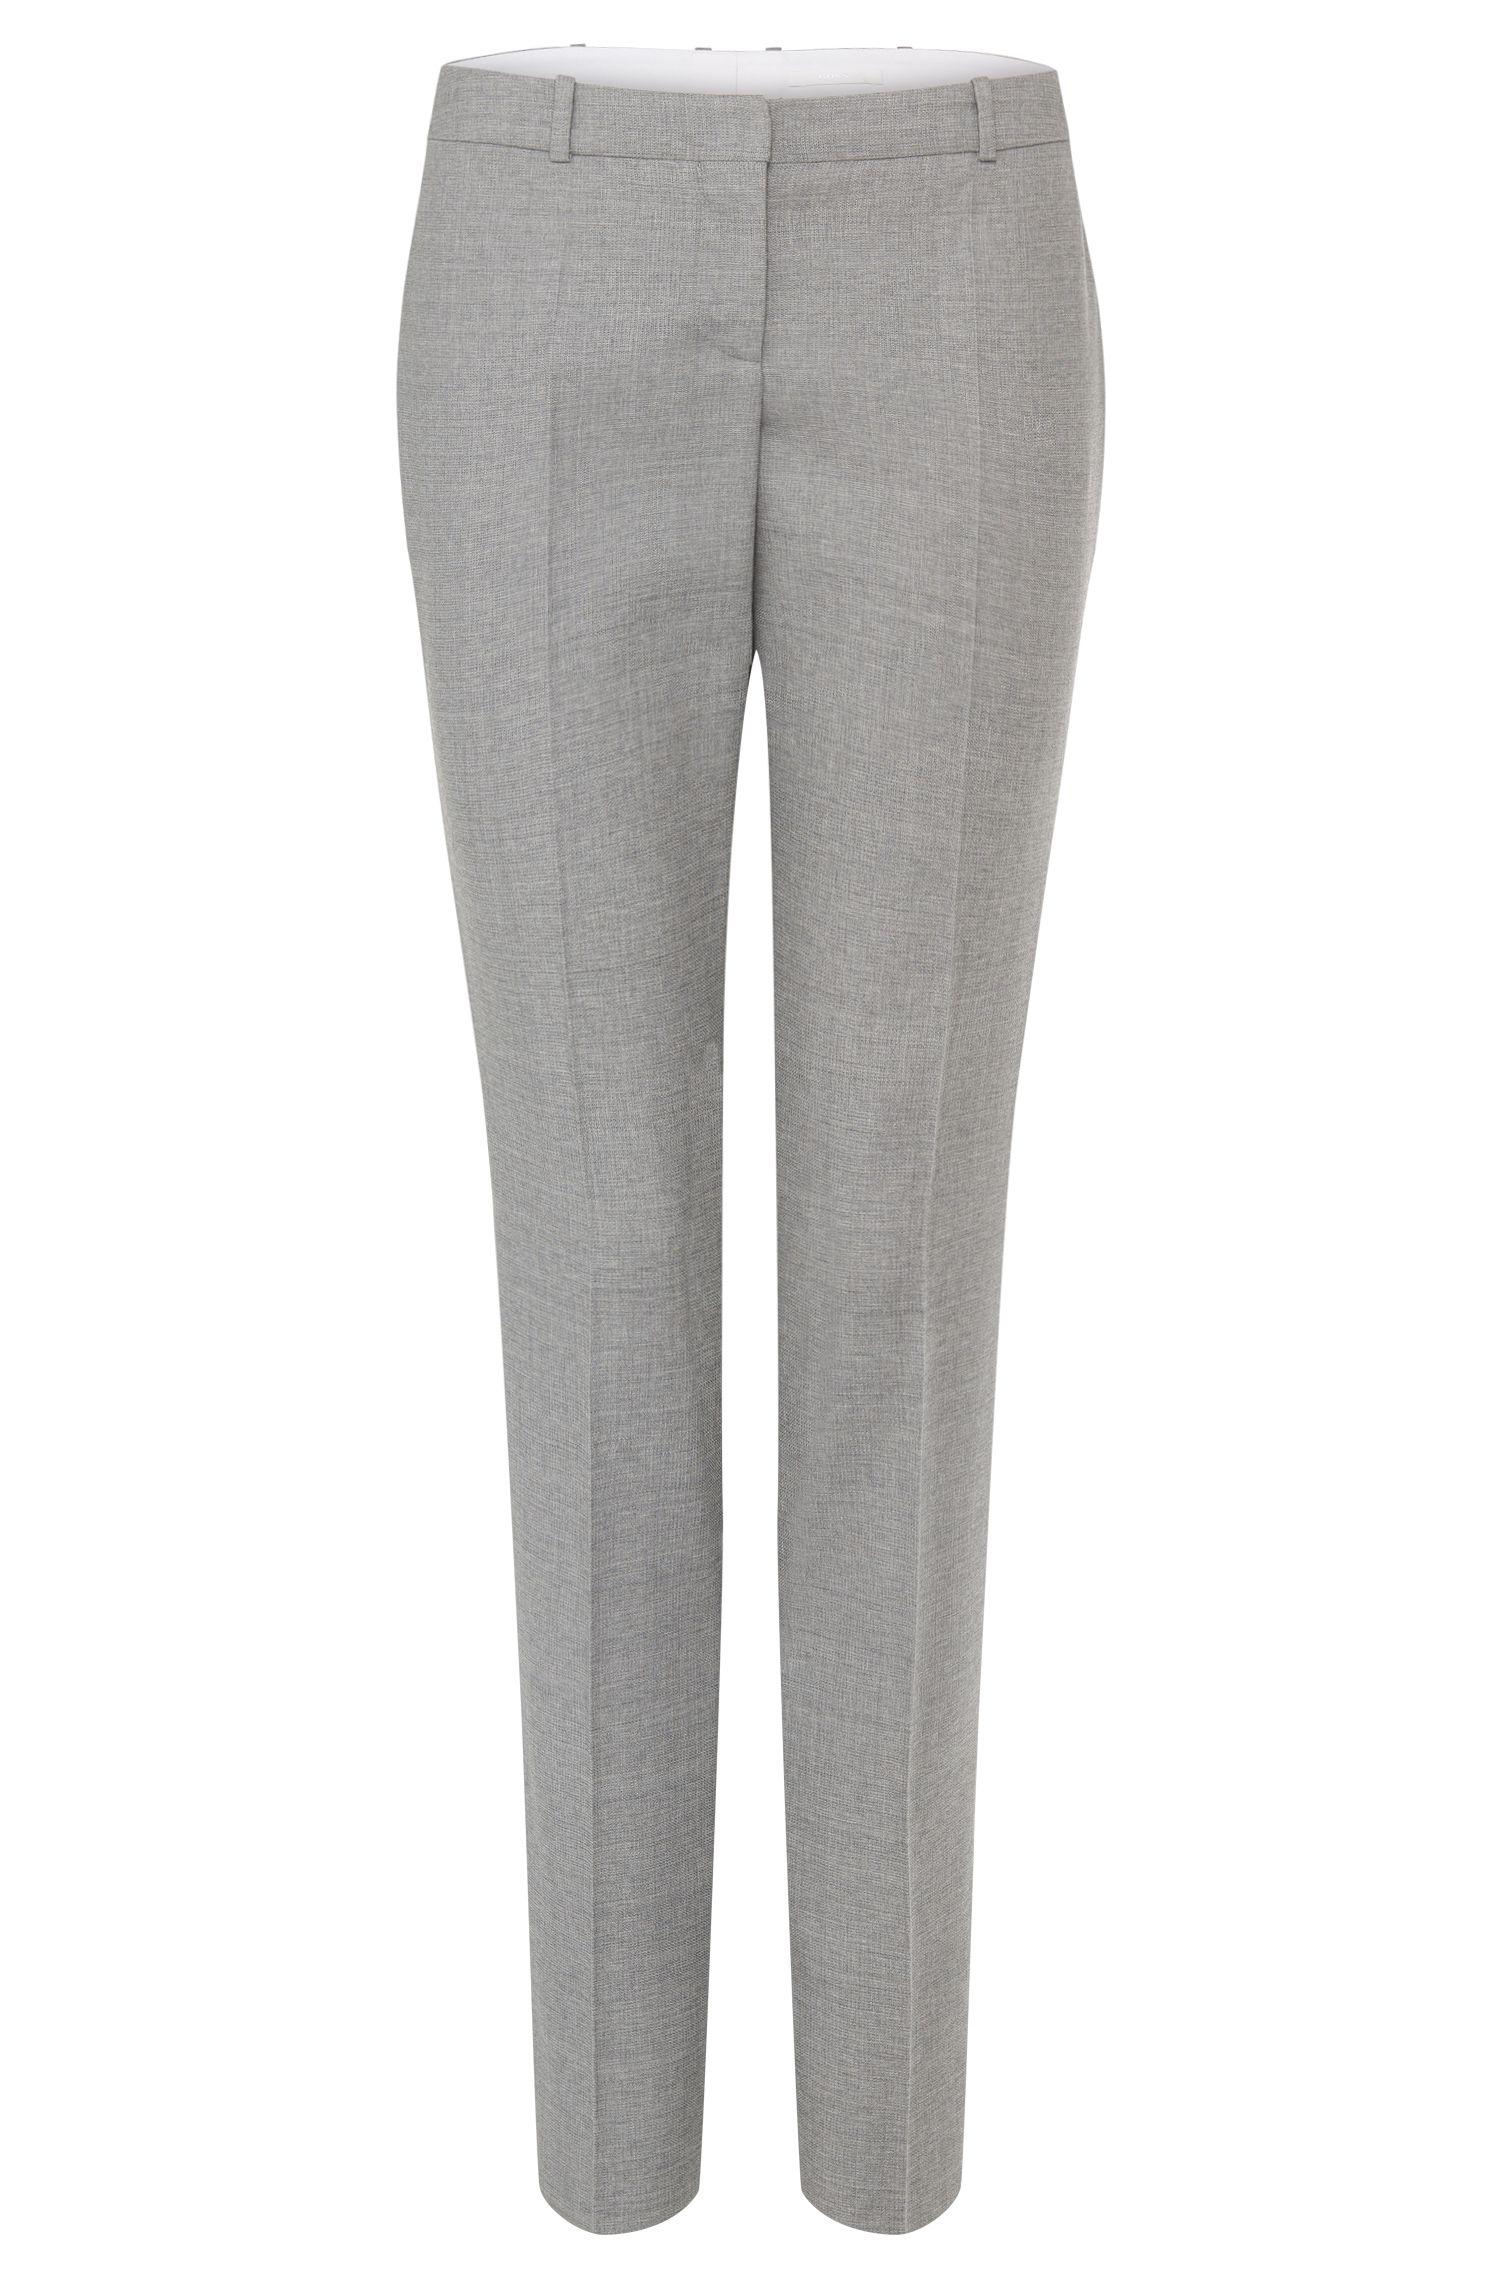 'Tiluni' | Virgin Woll Micro-Texutre Dress Pants